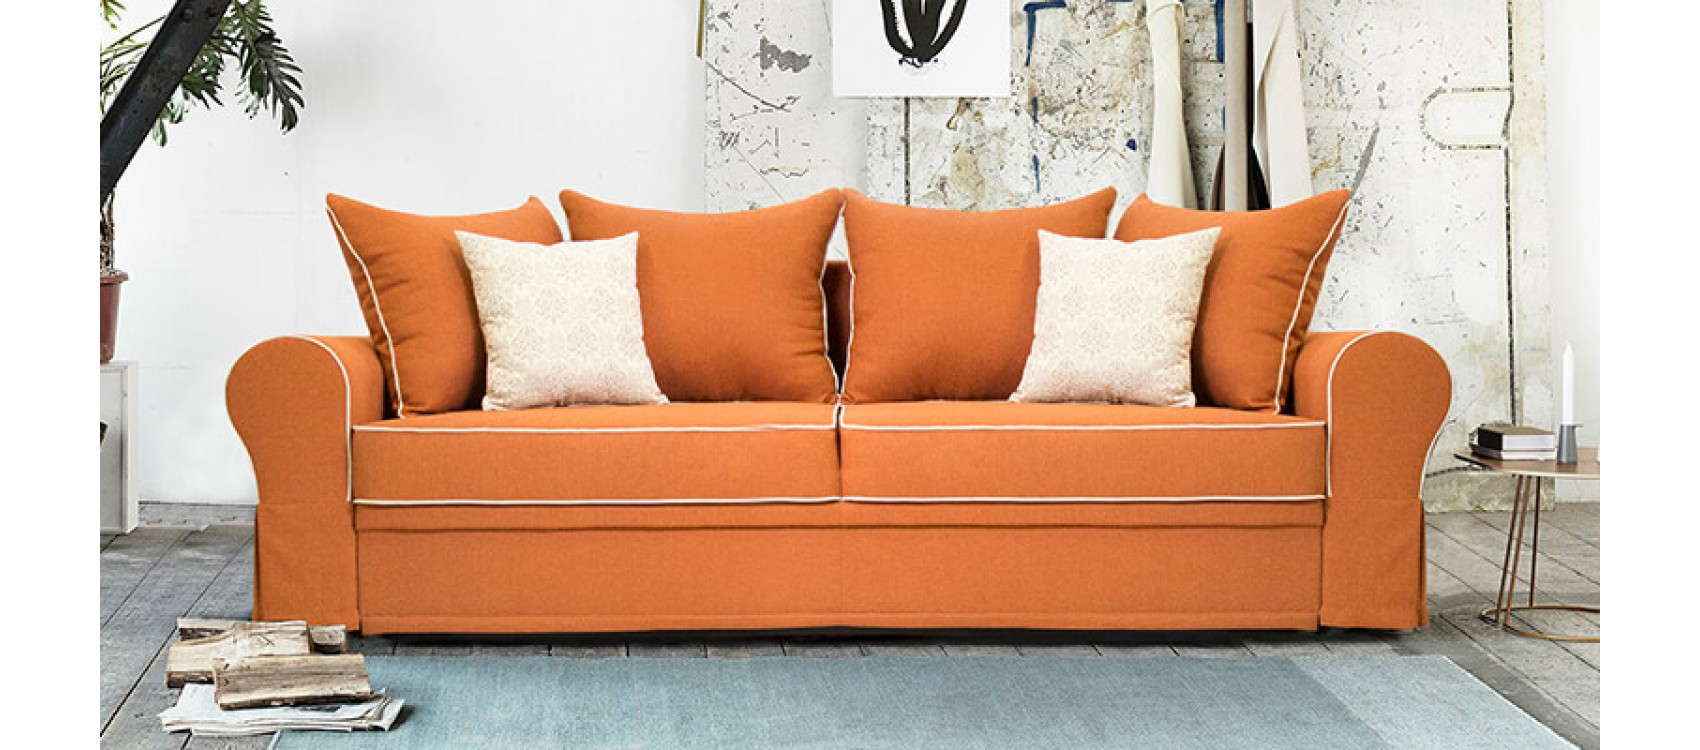 Sofa ALICE foto 2